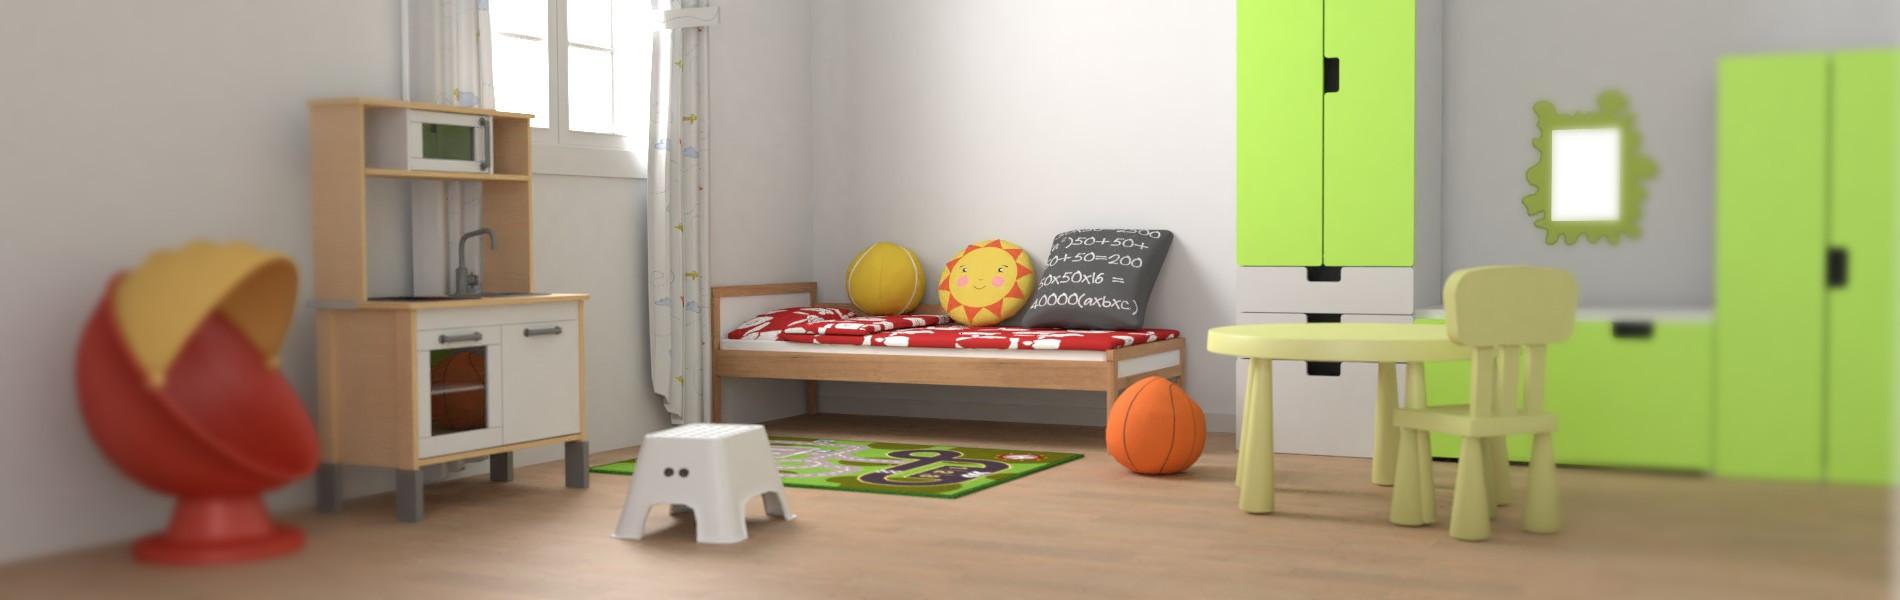 Ikea Models For Sweet Home